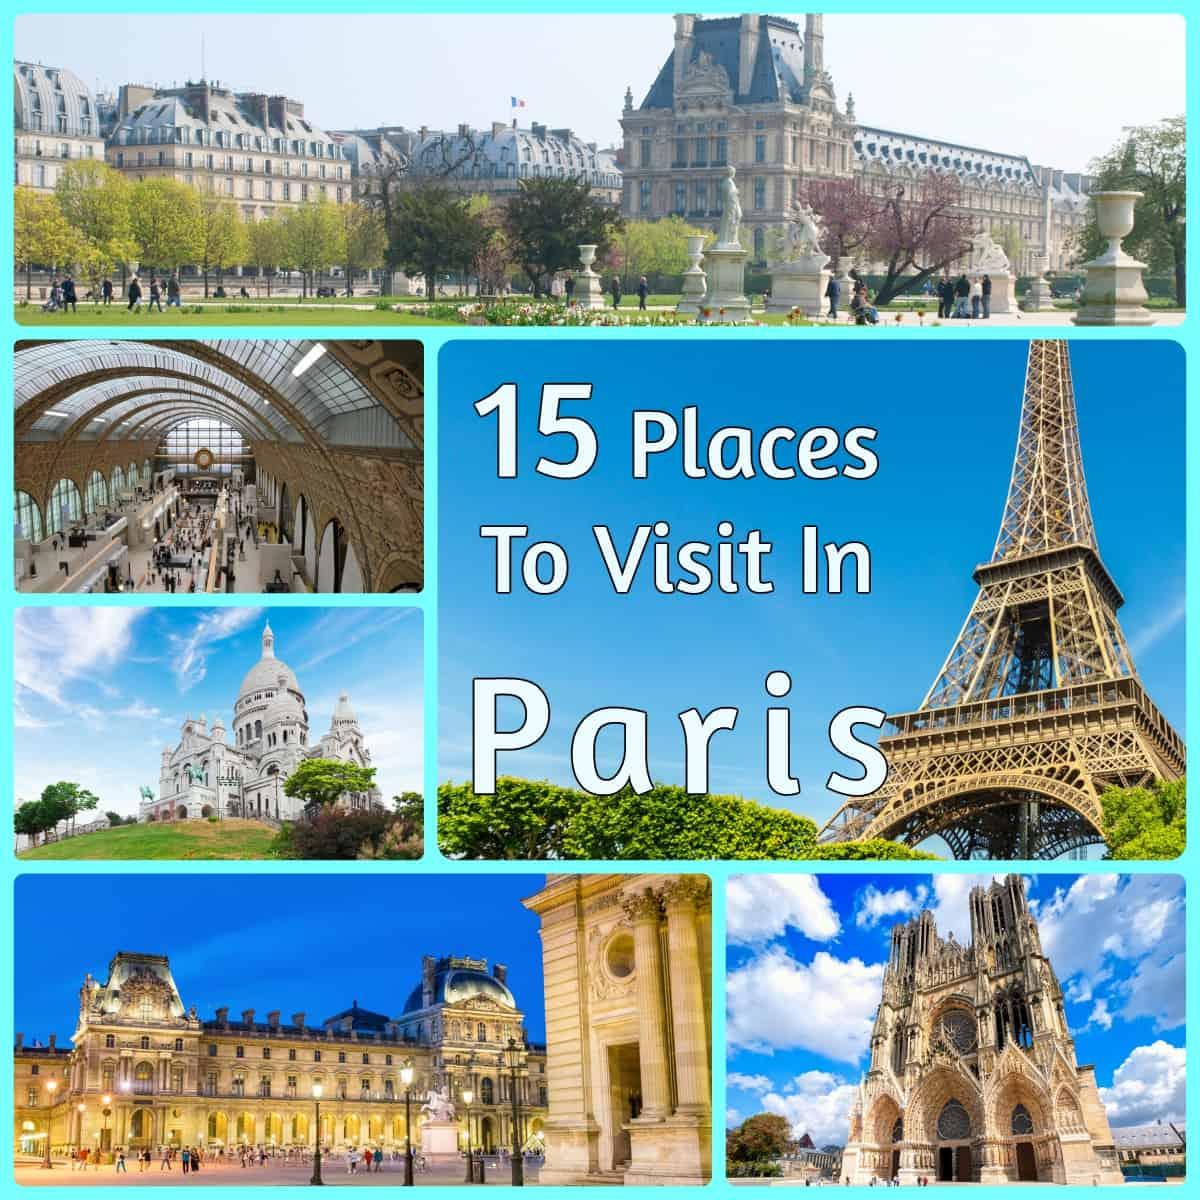 15 places to visit in paris